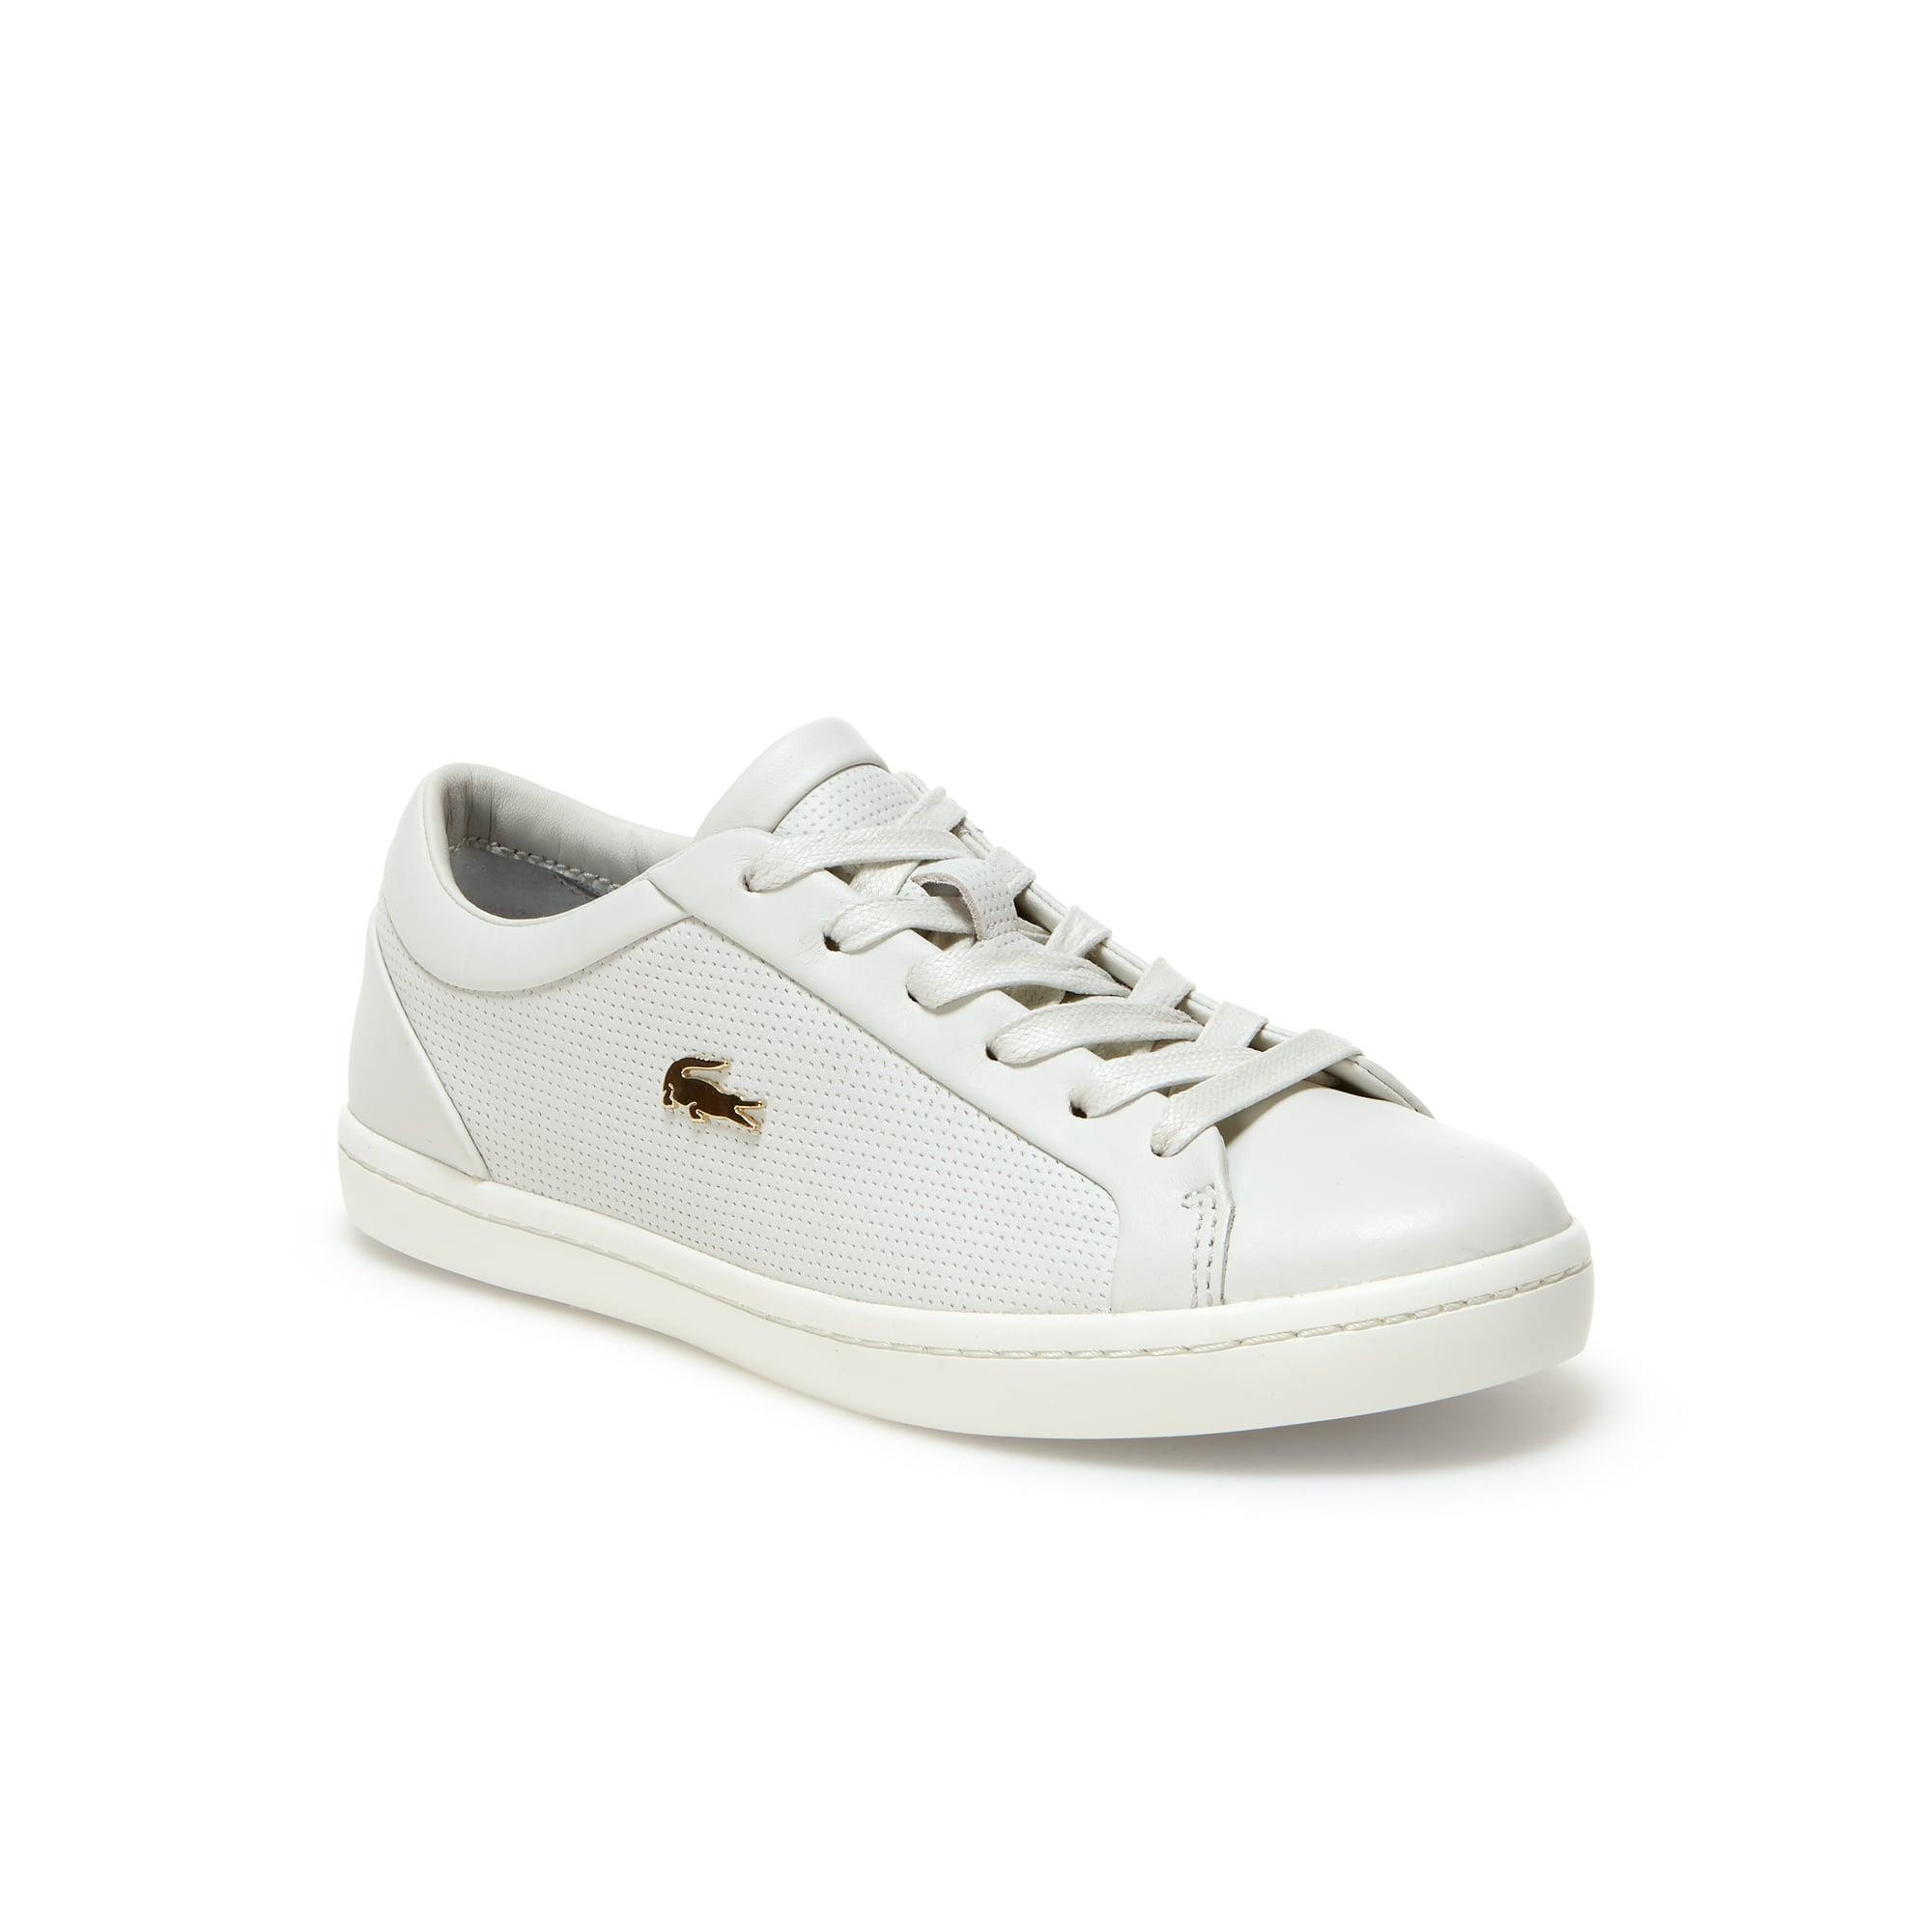 Sneakers Straightset in pelle nappa